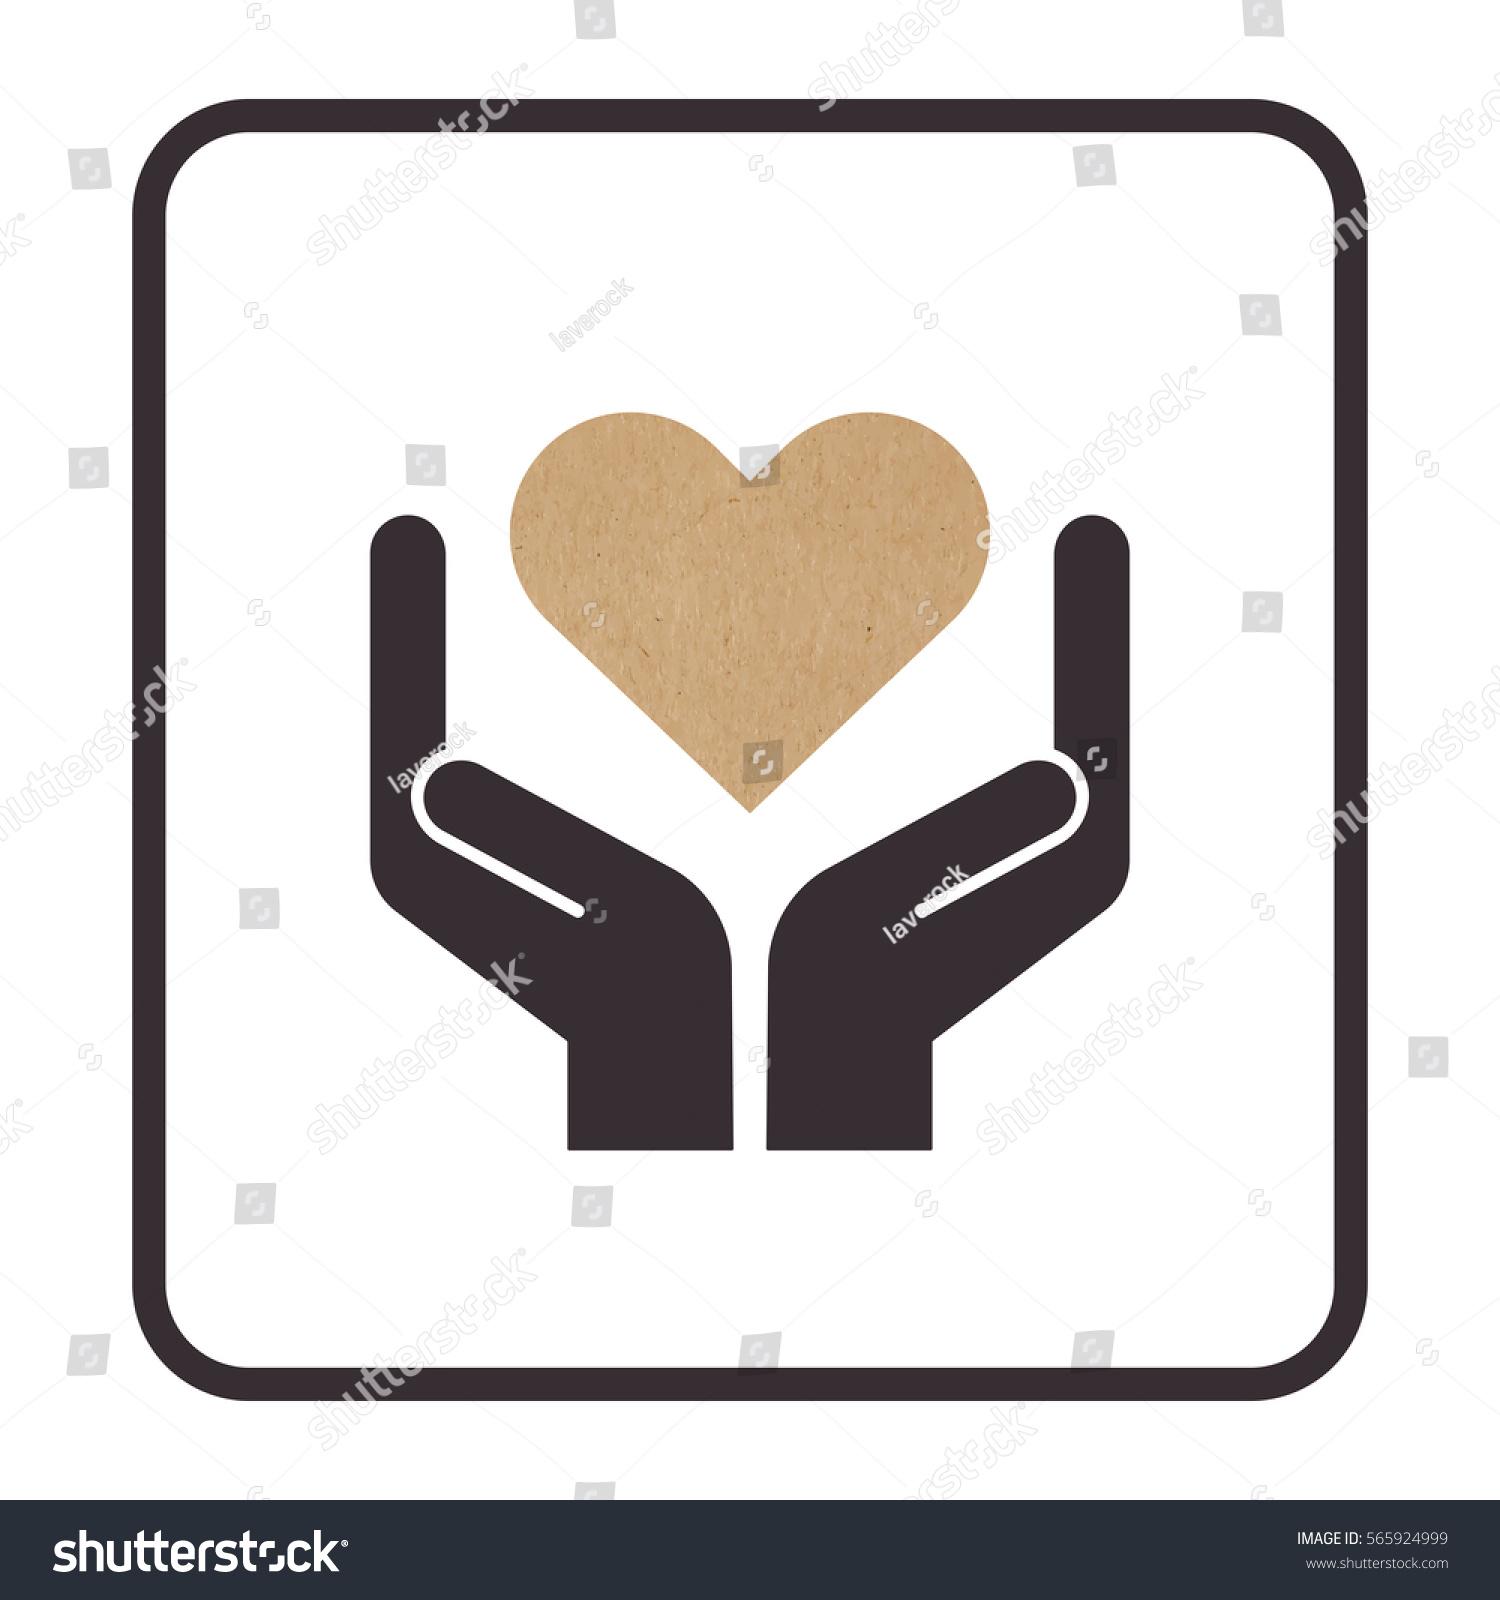 Vector illustration handle care symbol valentine stock vector vector illustration of handle with care symbol valentine card hands holding craft paper heart buycottarizona